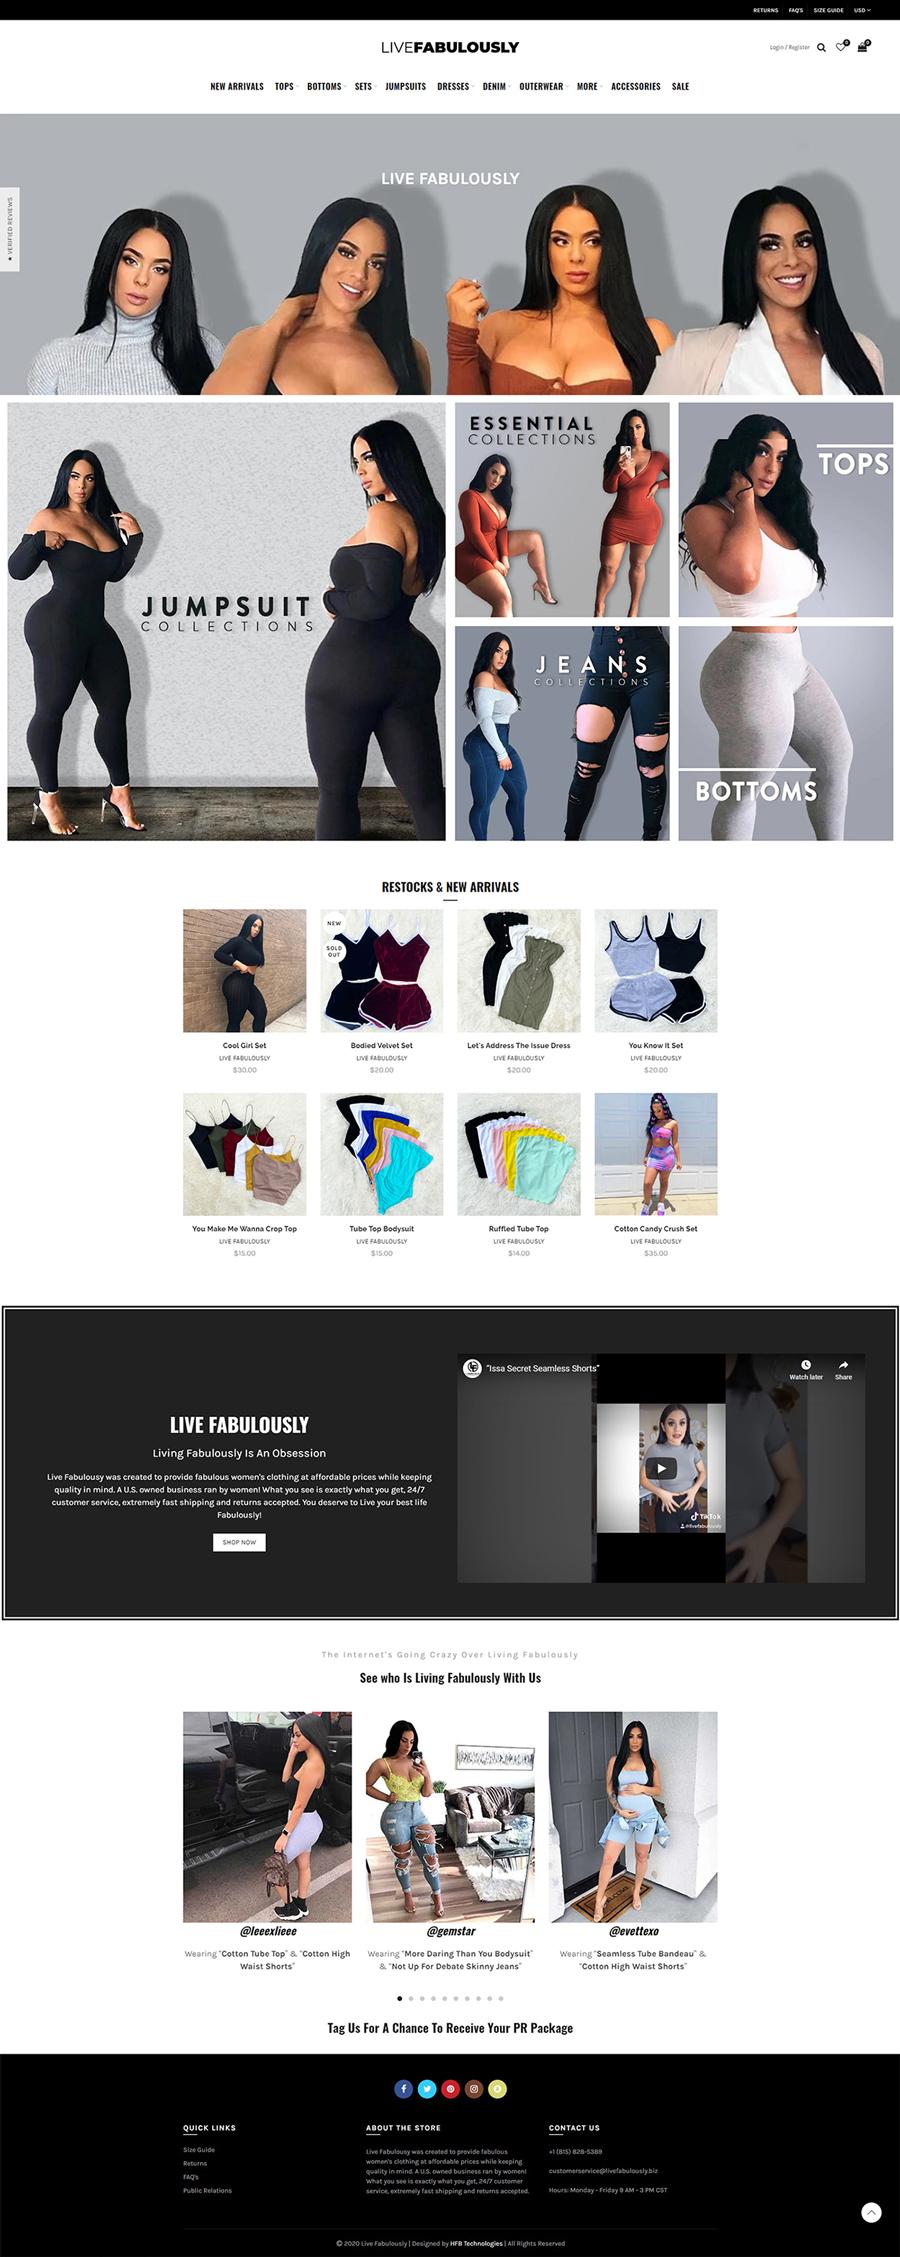 Live Fabulously Website Portfolio